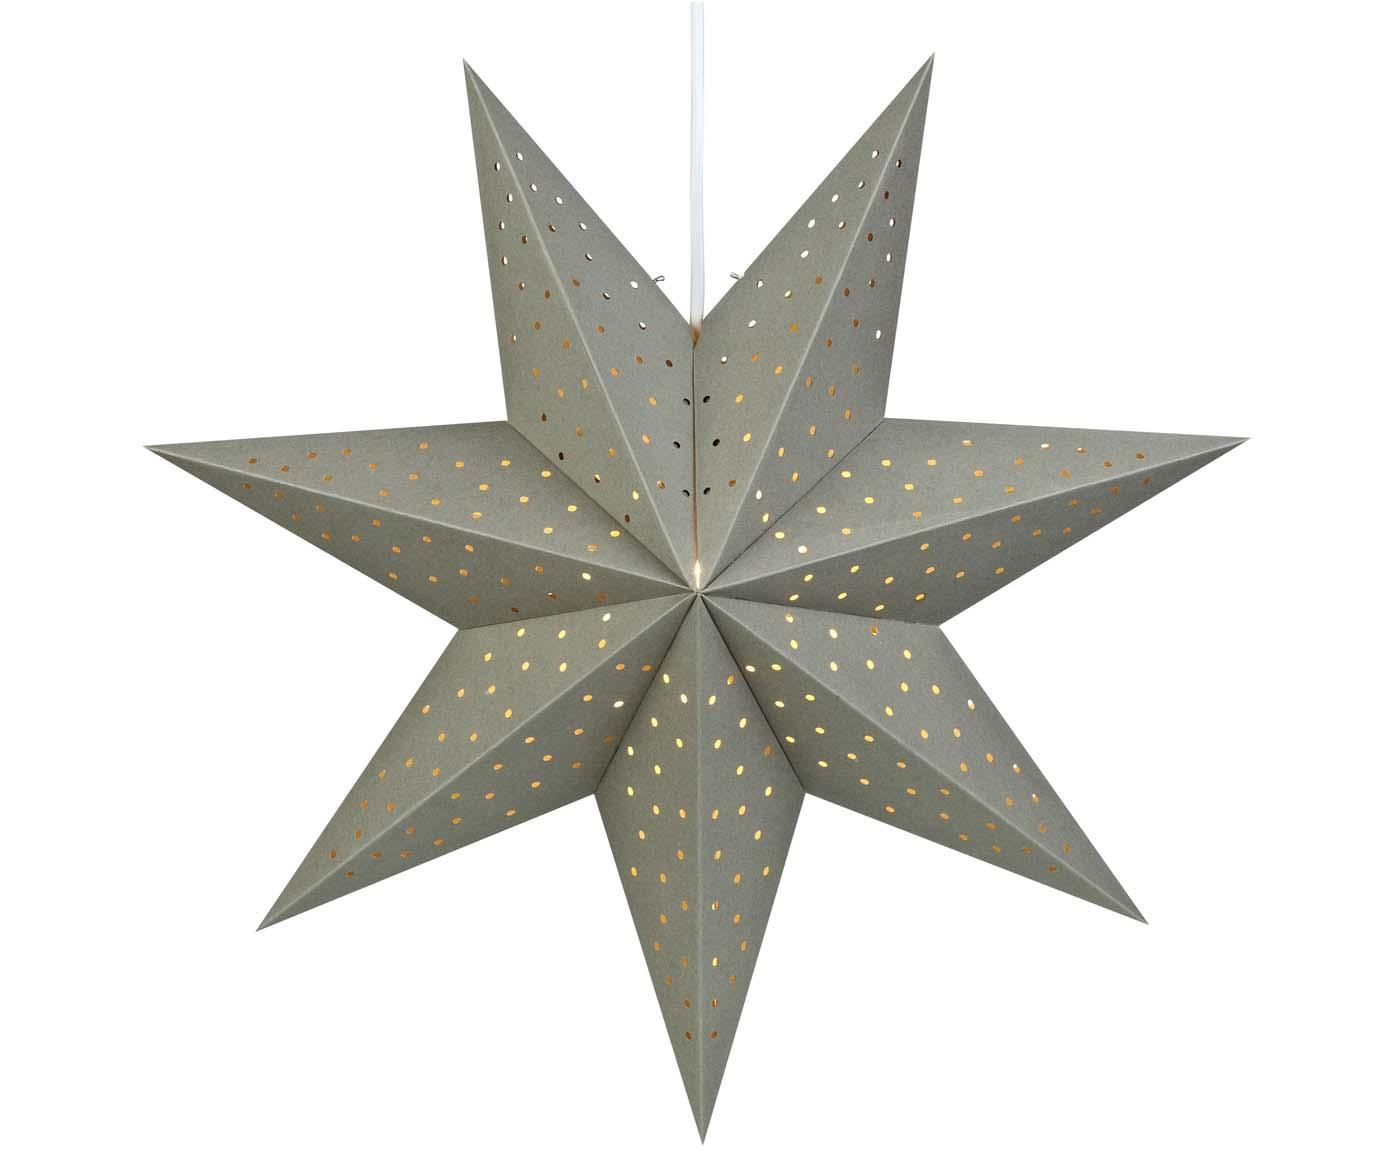 Weihnachtsstern Morris, Grau, Ø 45 cm